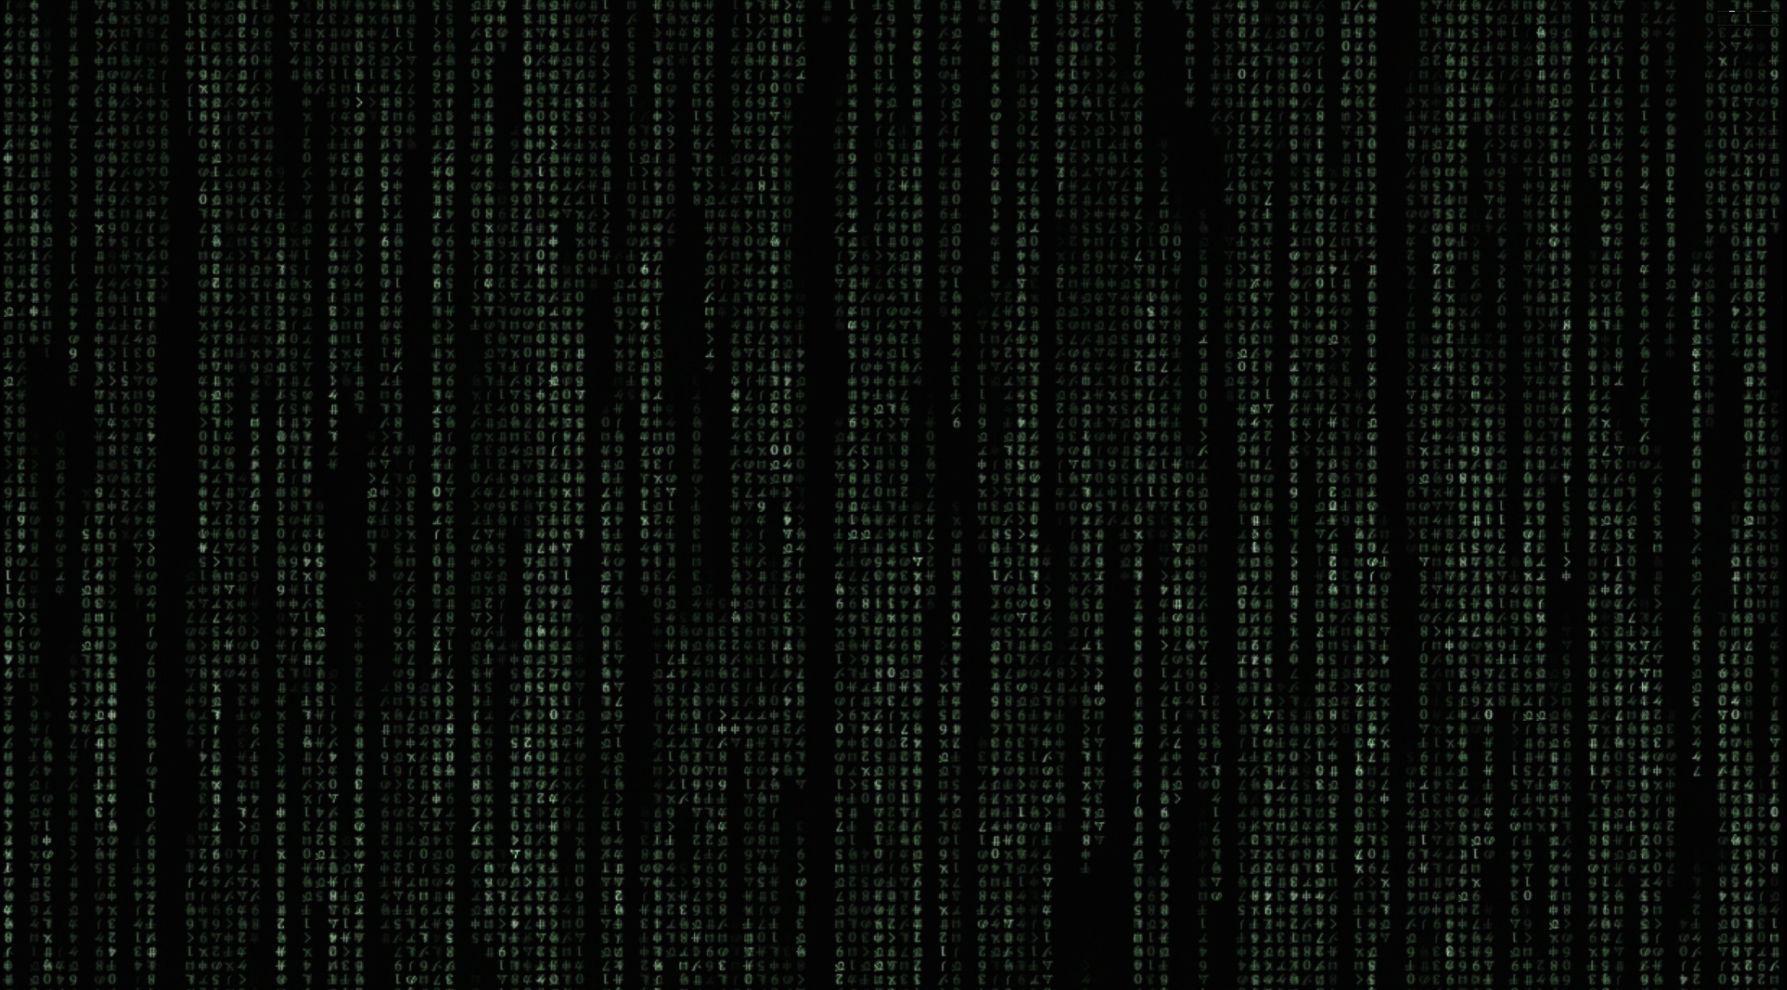 50 Best Free Code Wallpapers Wallpaperaccess